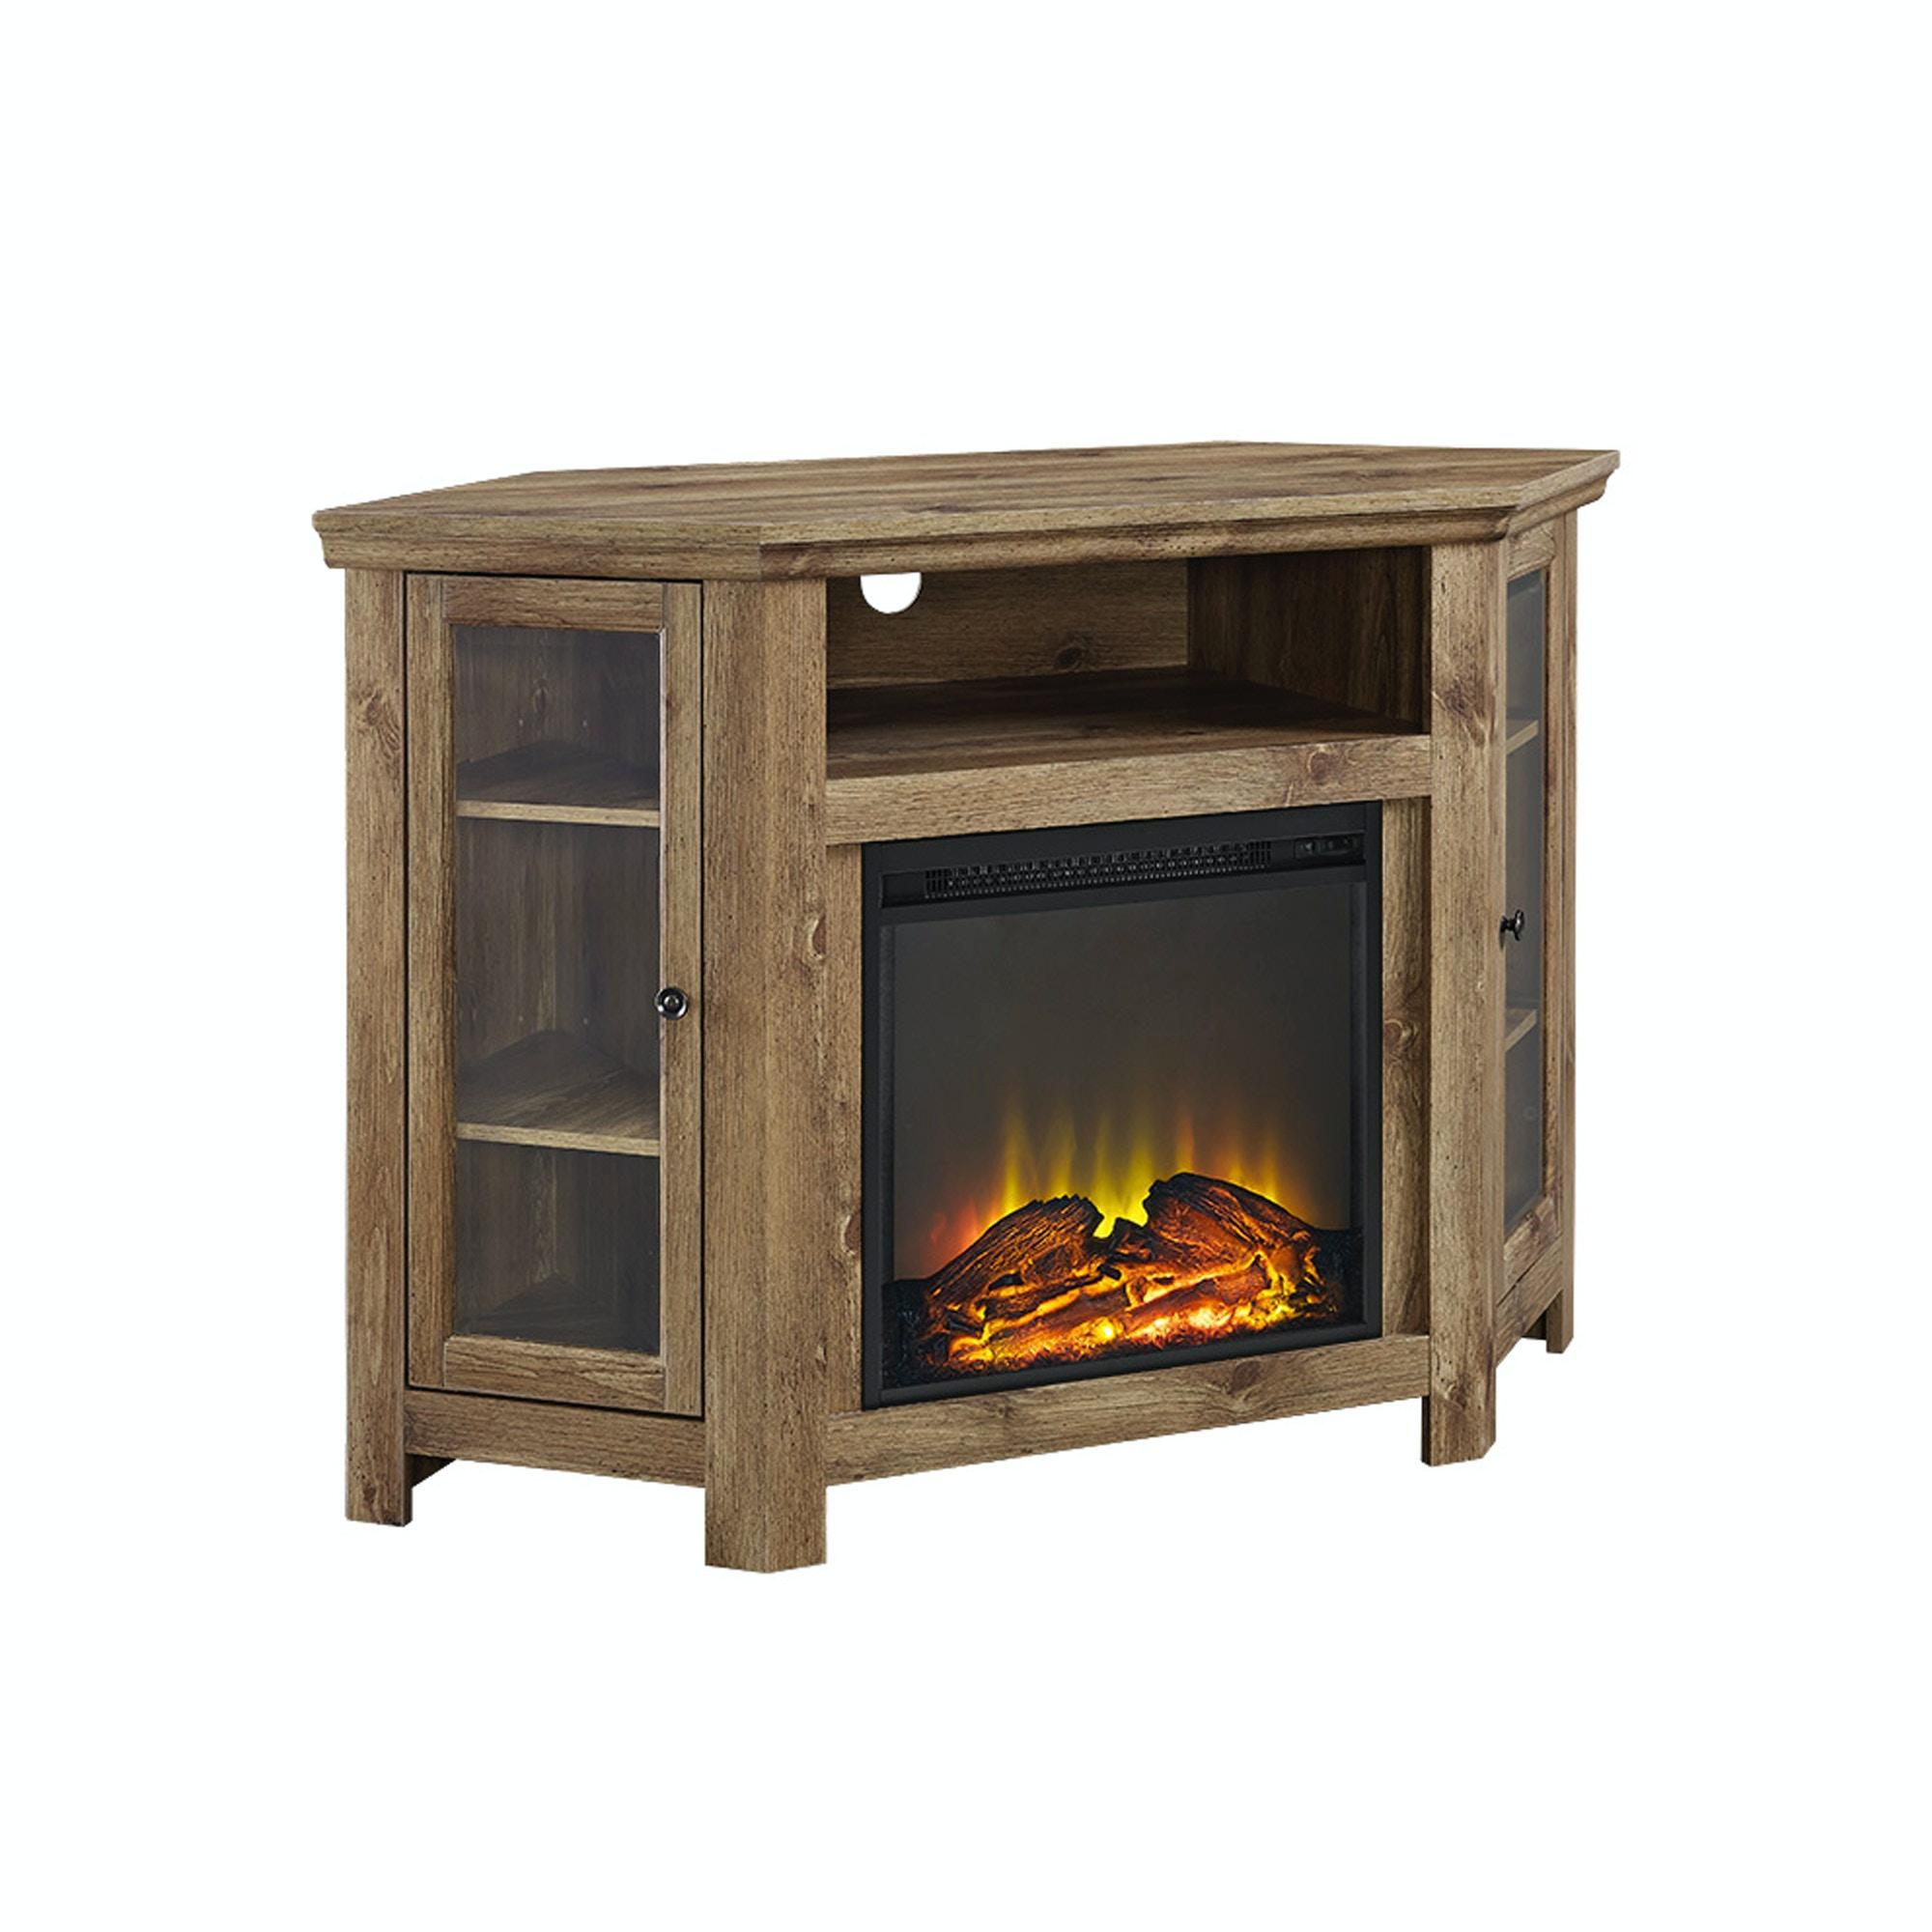 48 Corner Fireplace Tv Stand Wedw48fpcrbw